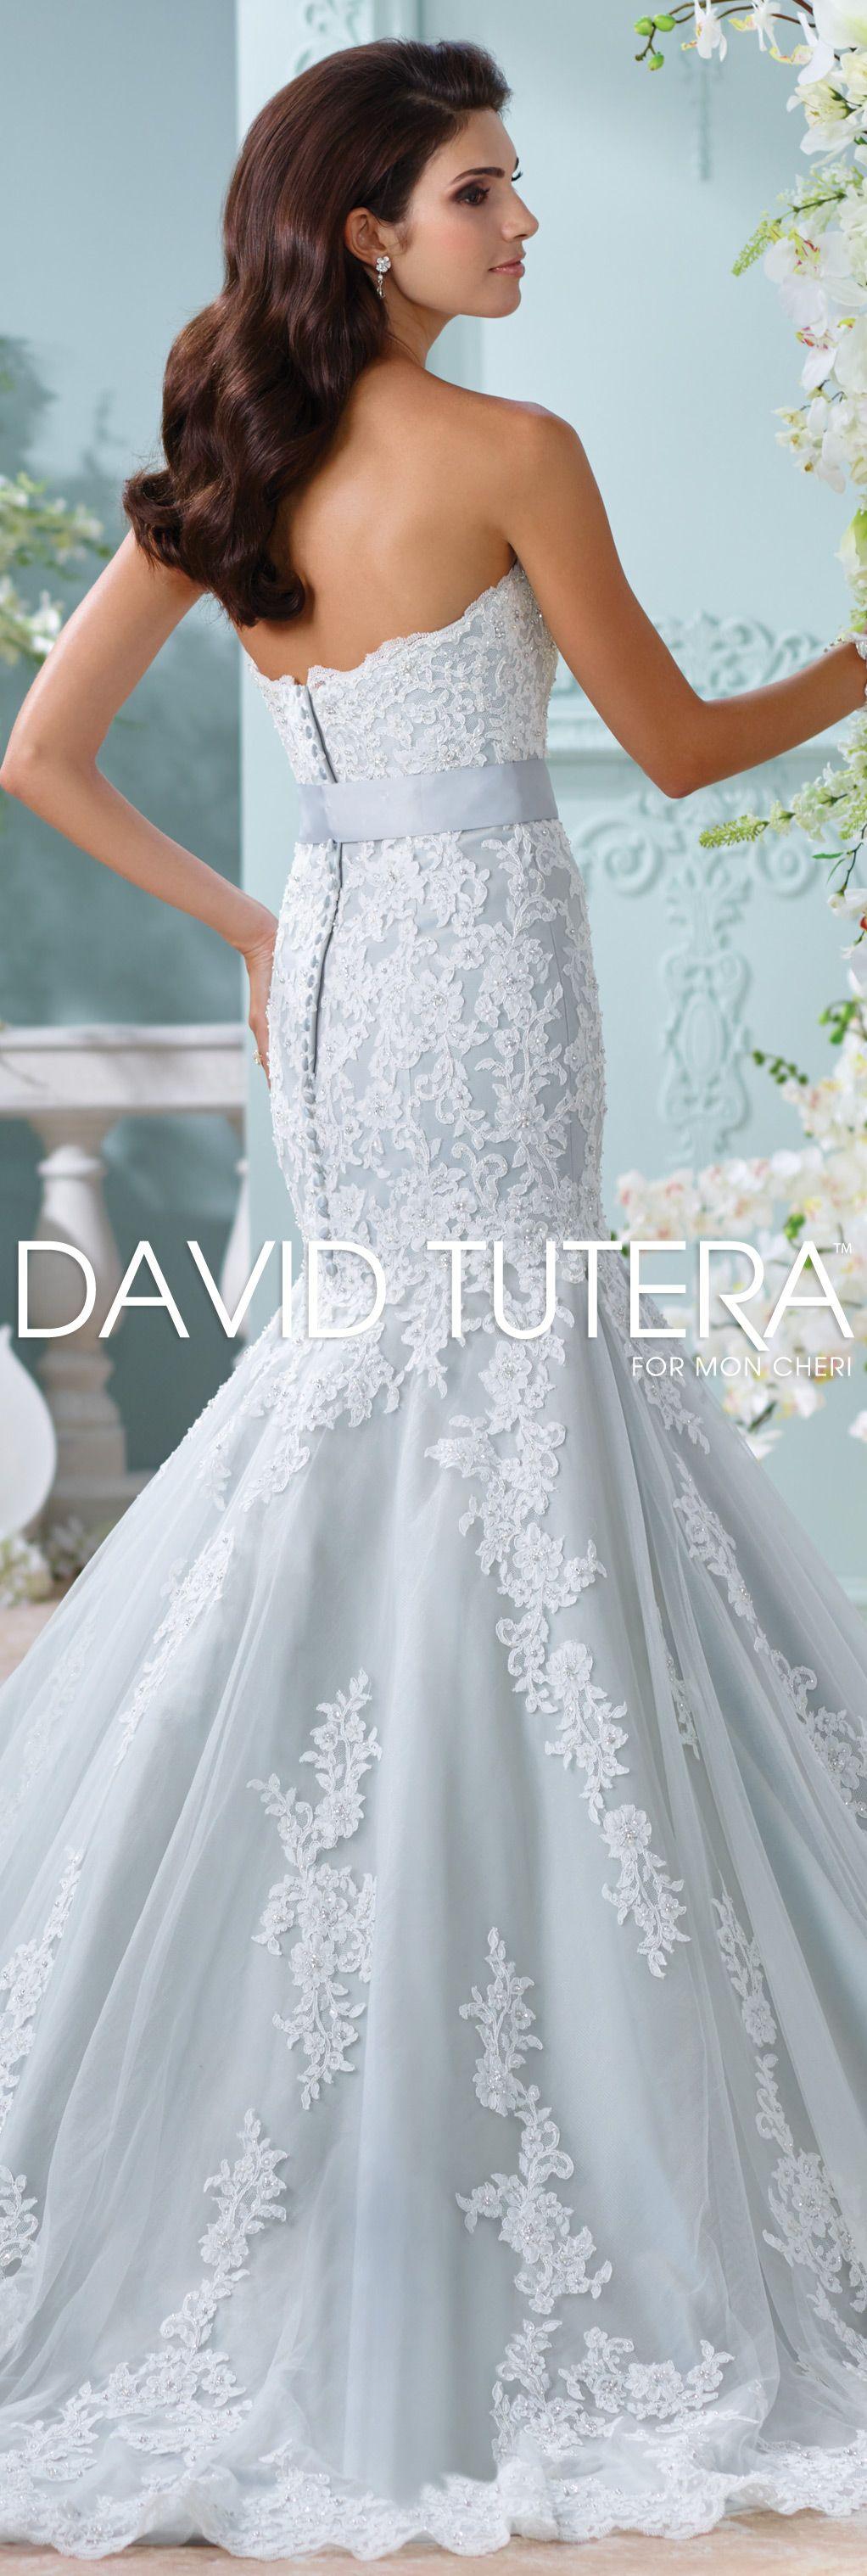 The David Tutera for Mon Cheri Spring 2016 Wedding Gown Collection ...